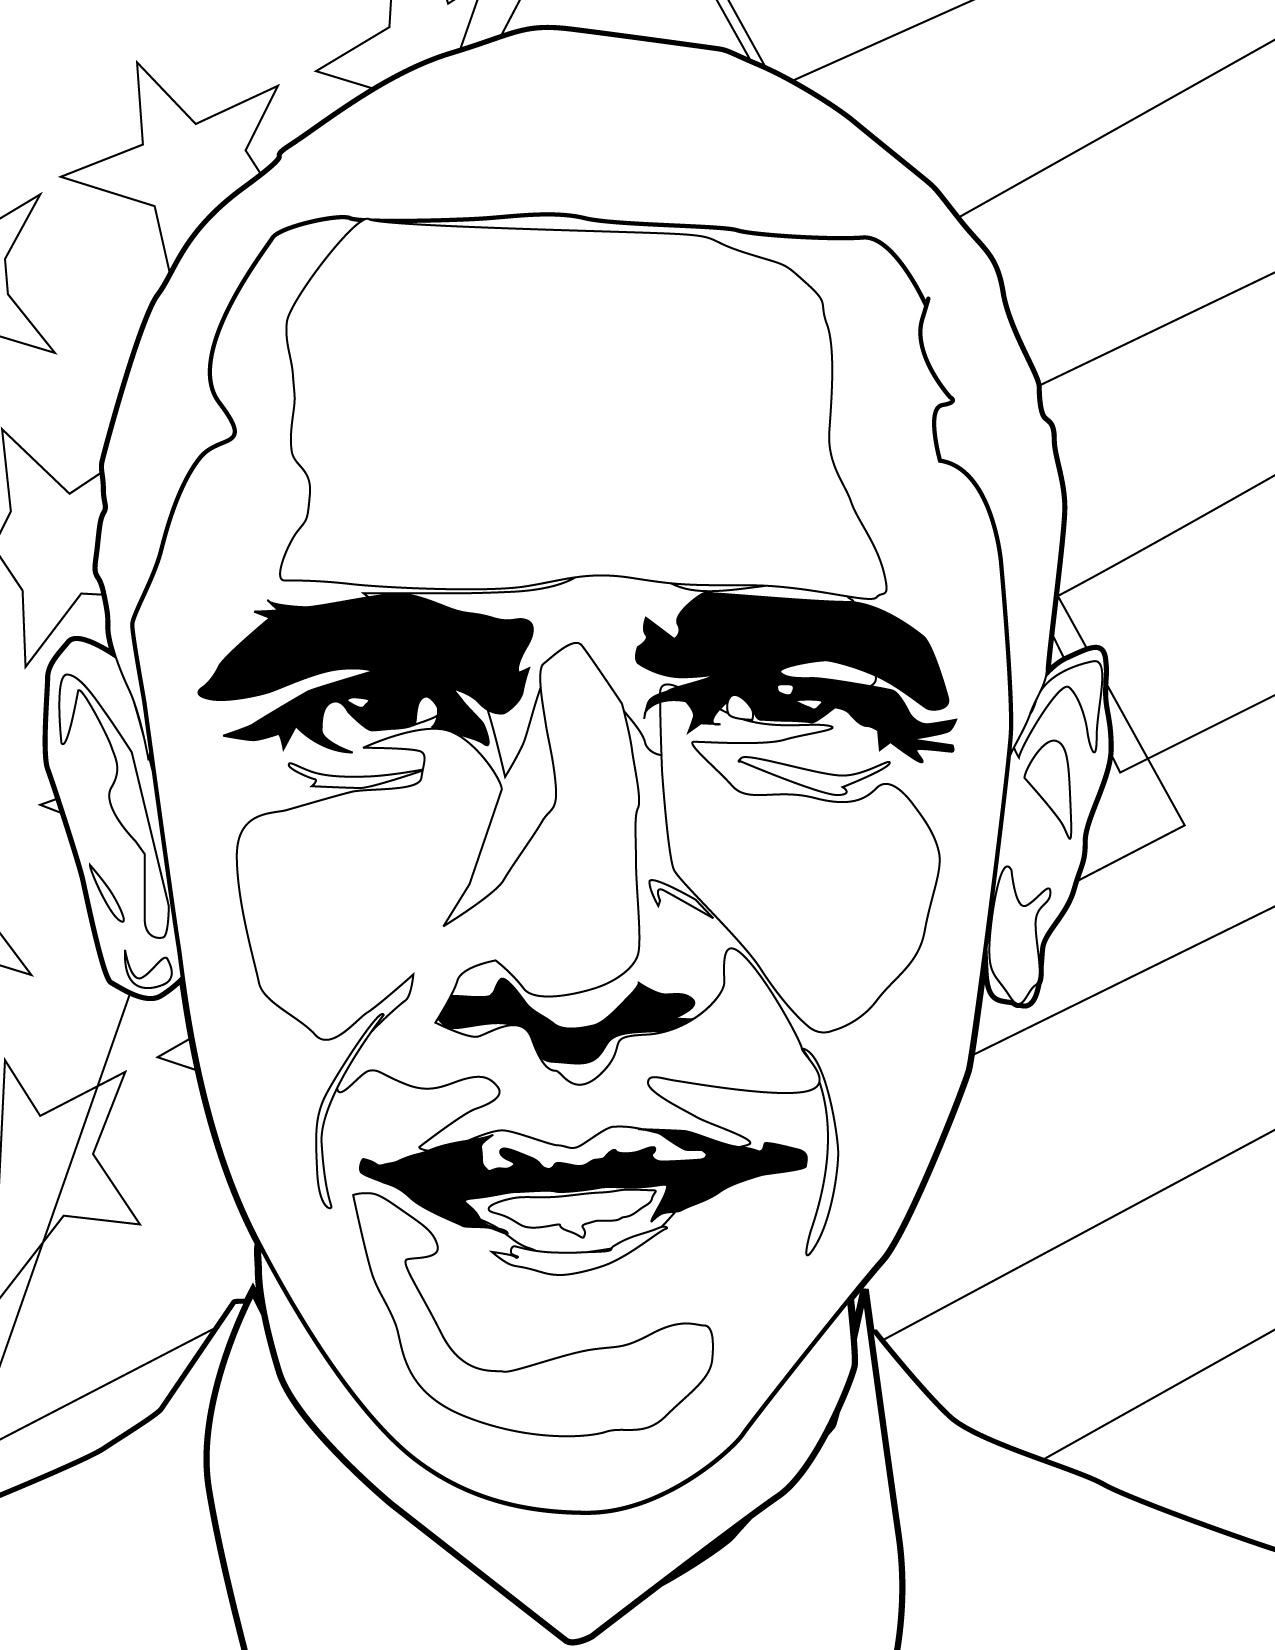 1275x1650 President Obama Coloring Page Barack Obama